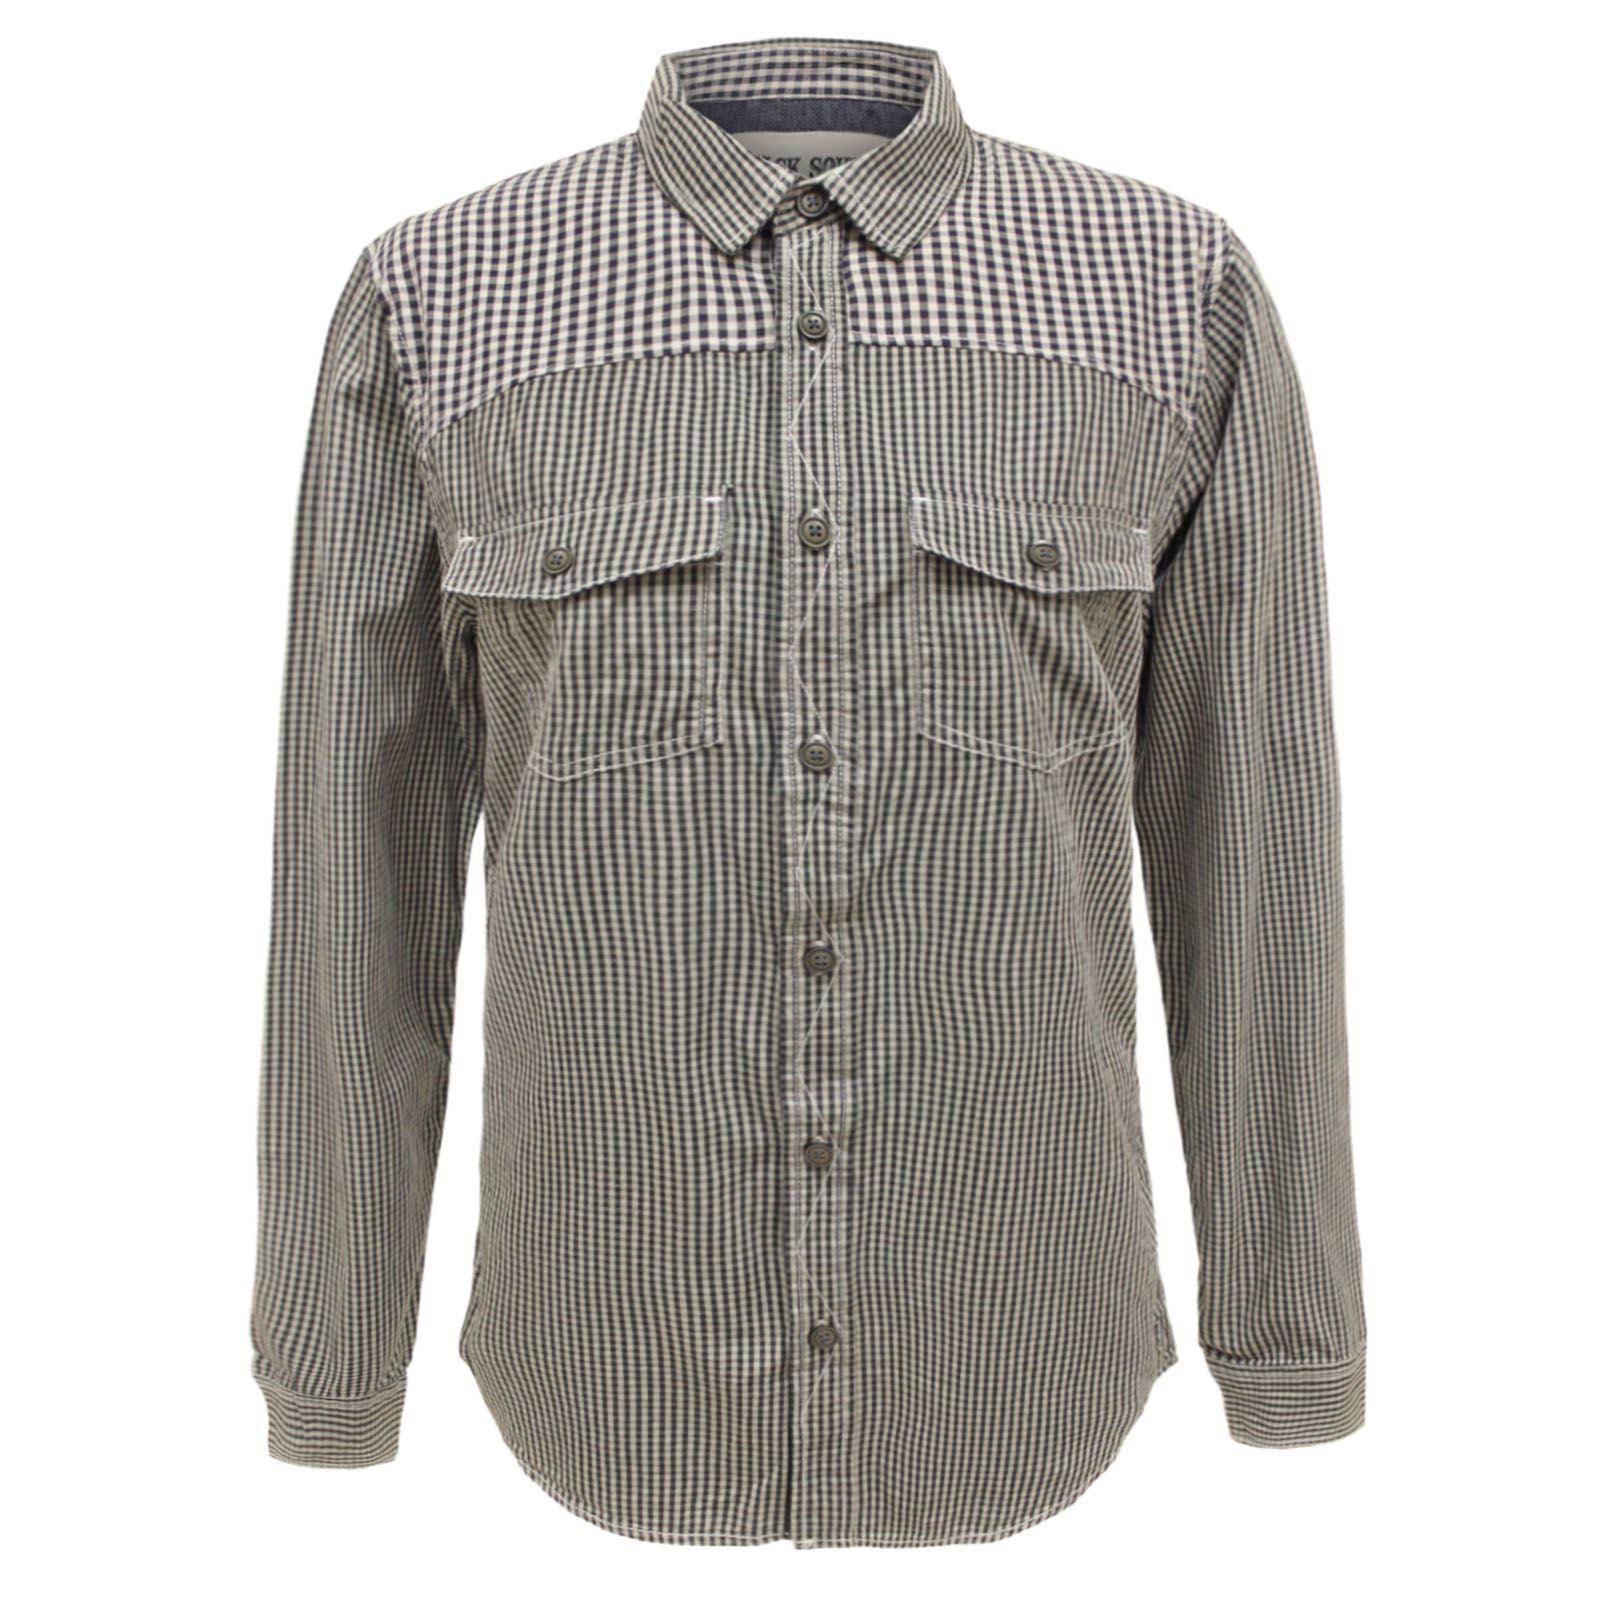 Mens Designer Casual Vintage Button Down Checked Plaid